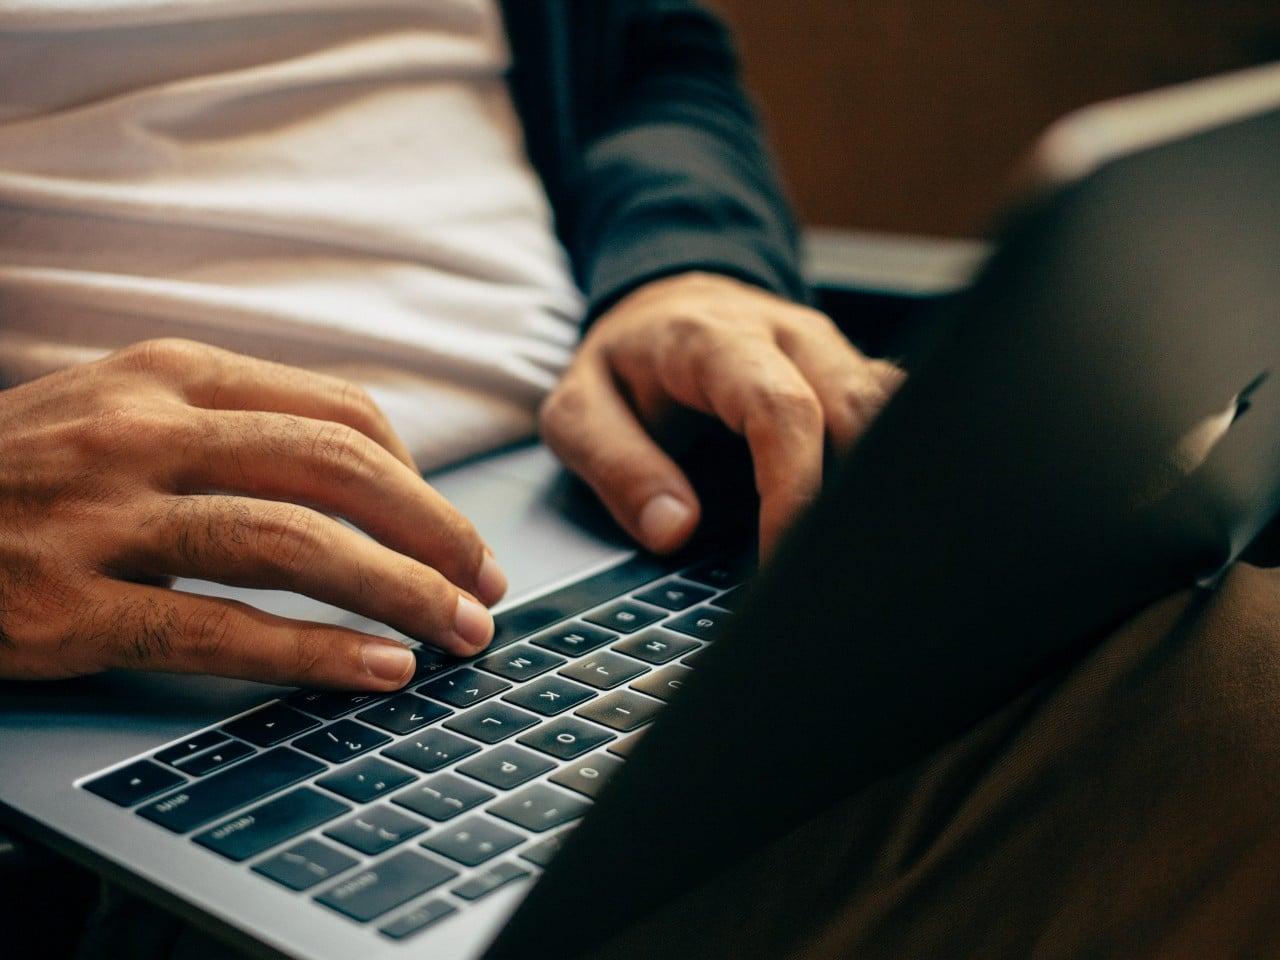 Cibersexo, trucos para mejorarlo